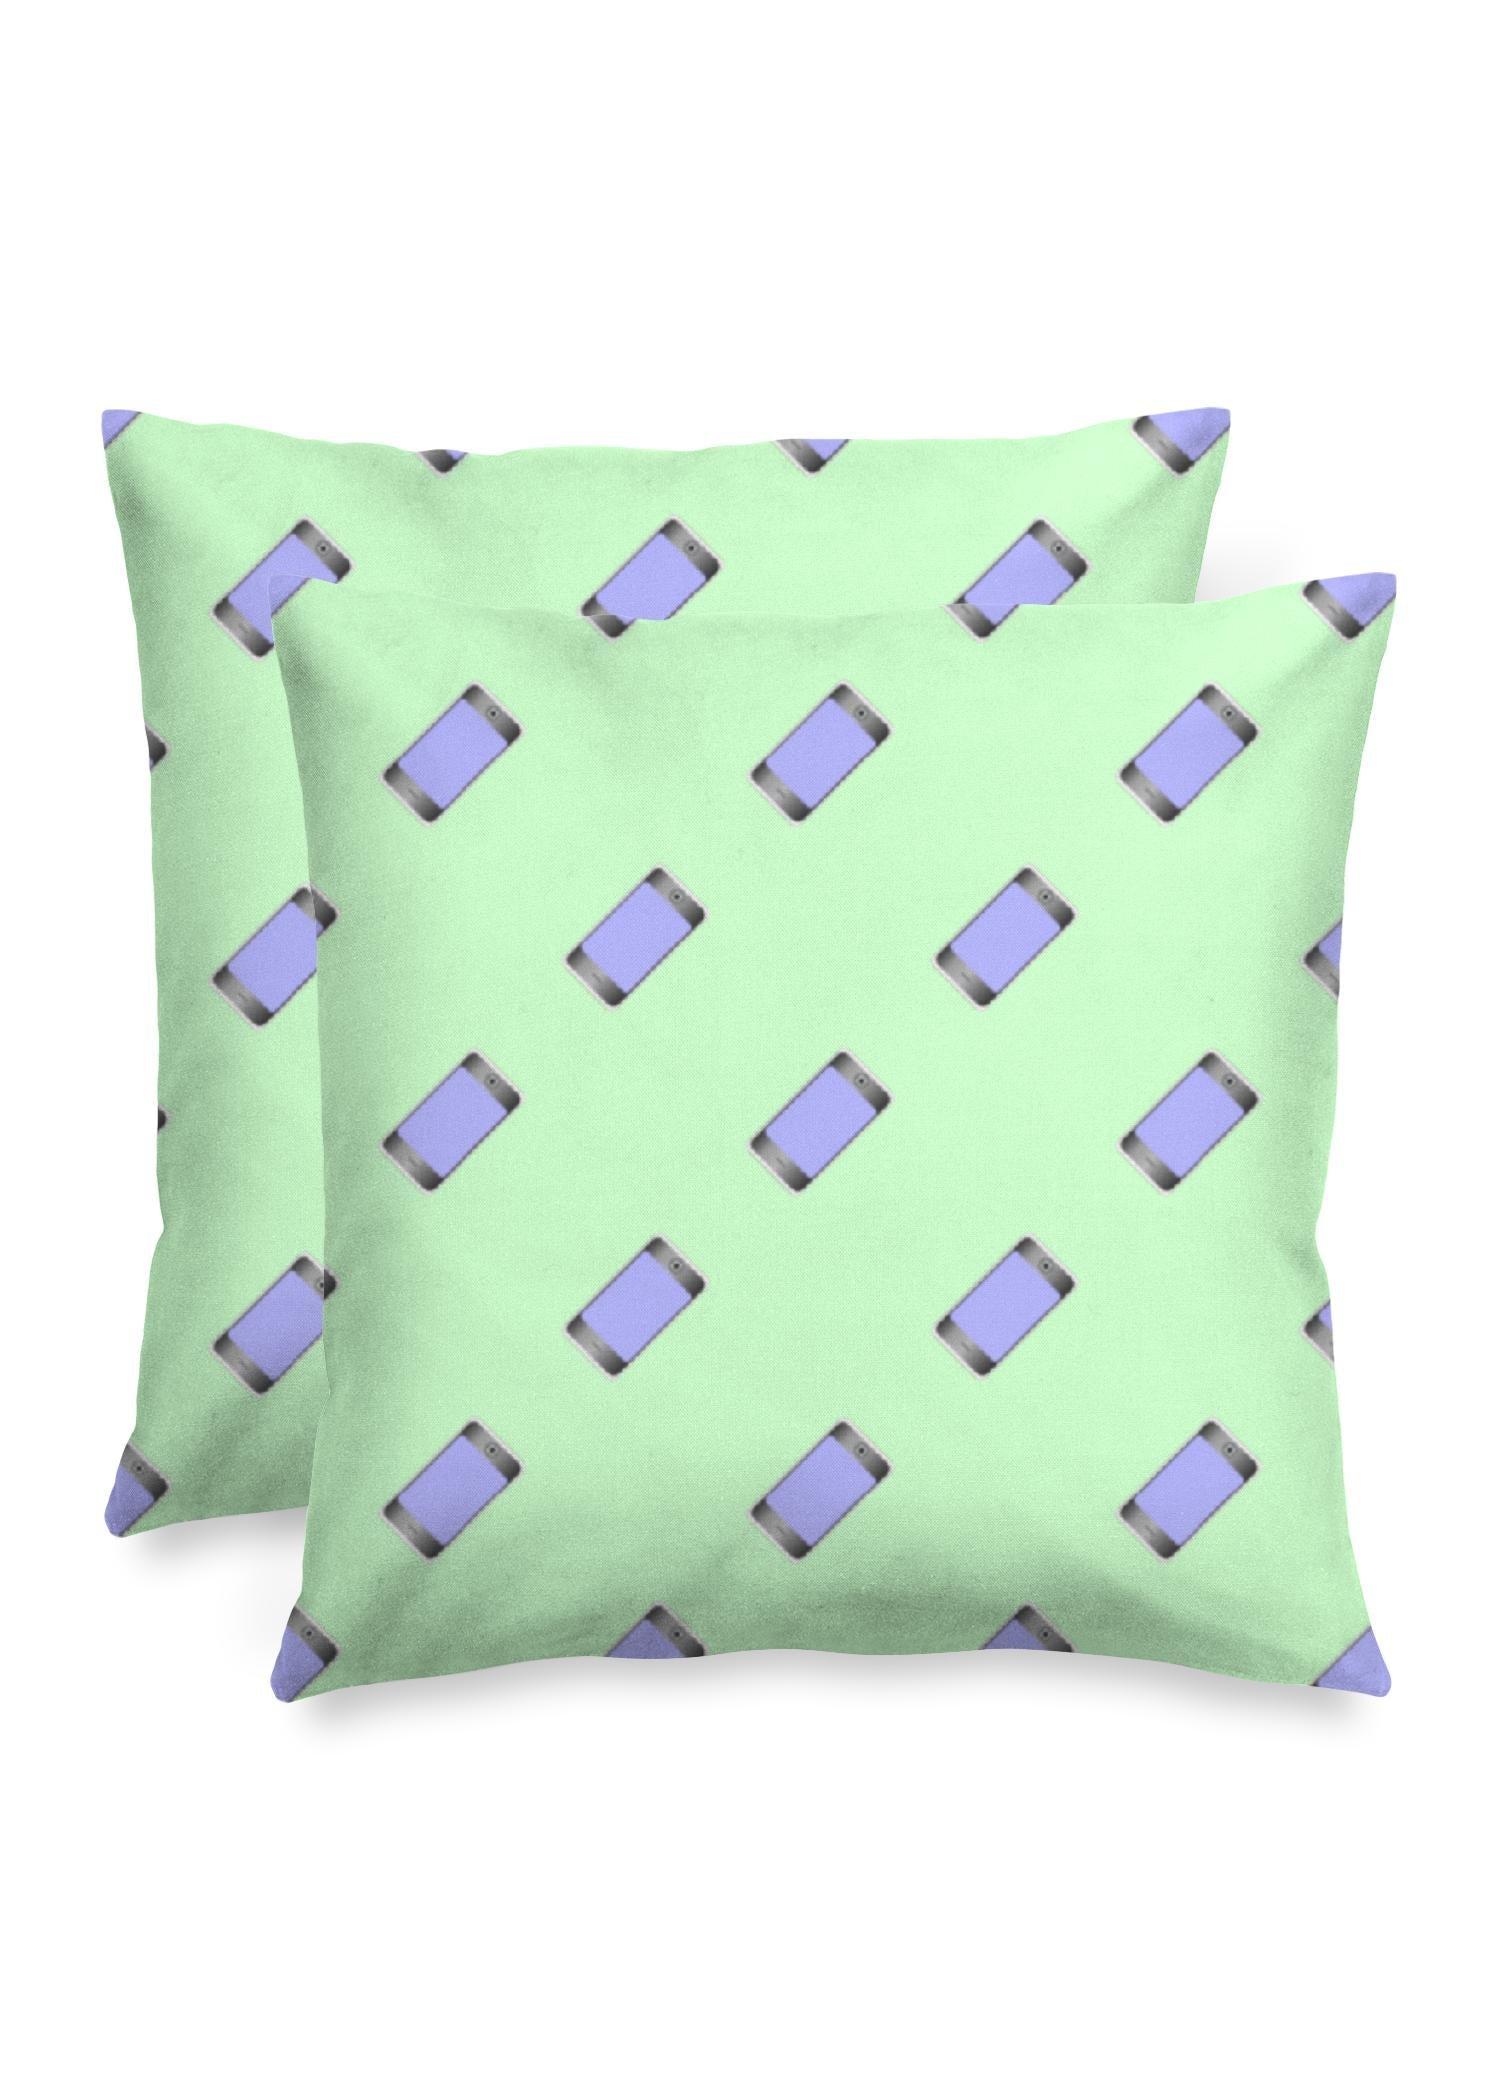 "VIDA Square Pillow - Mobile Phones On Green in Green by VIDA Original Artist  - Size: Matte / 20"" / Single"